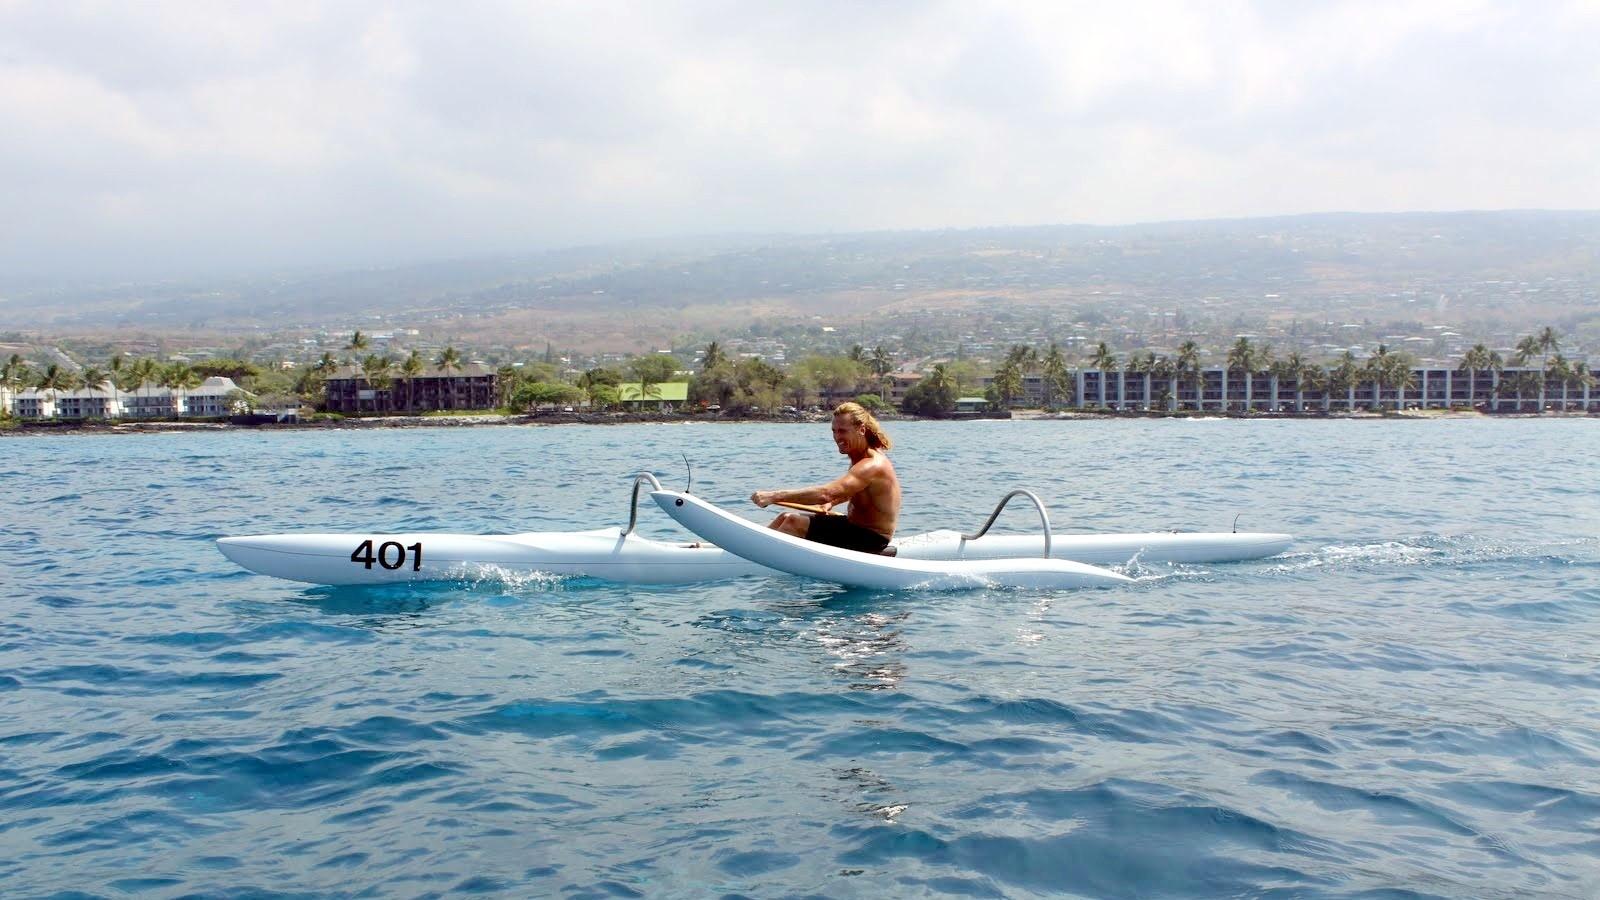 Prof. Barkhoff paddling in a one-man canoe in Keauhou Bay. Island in background.